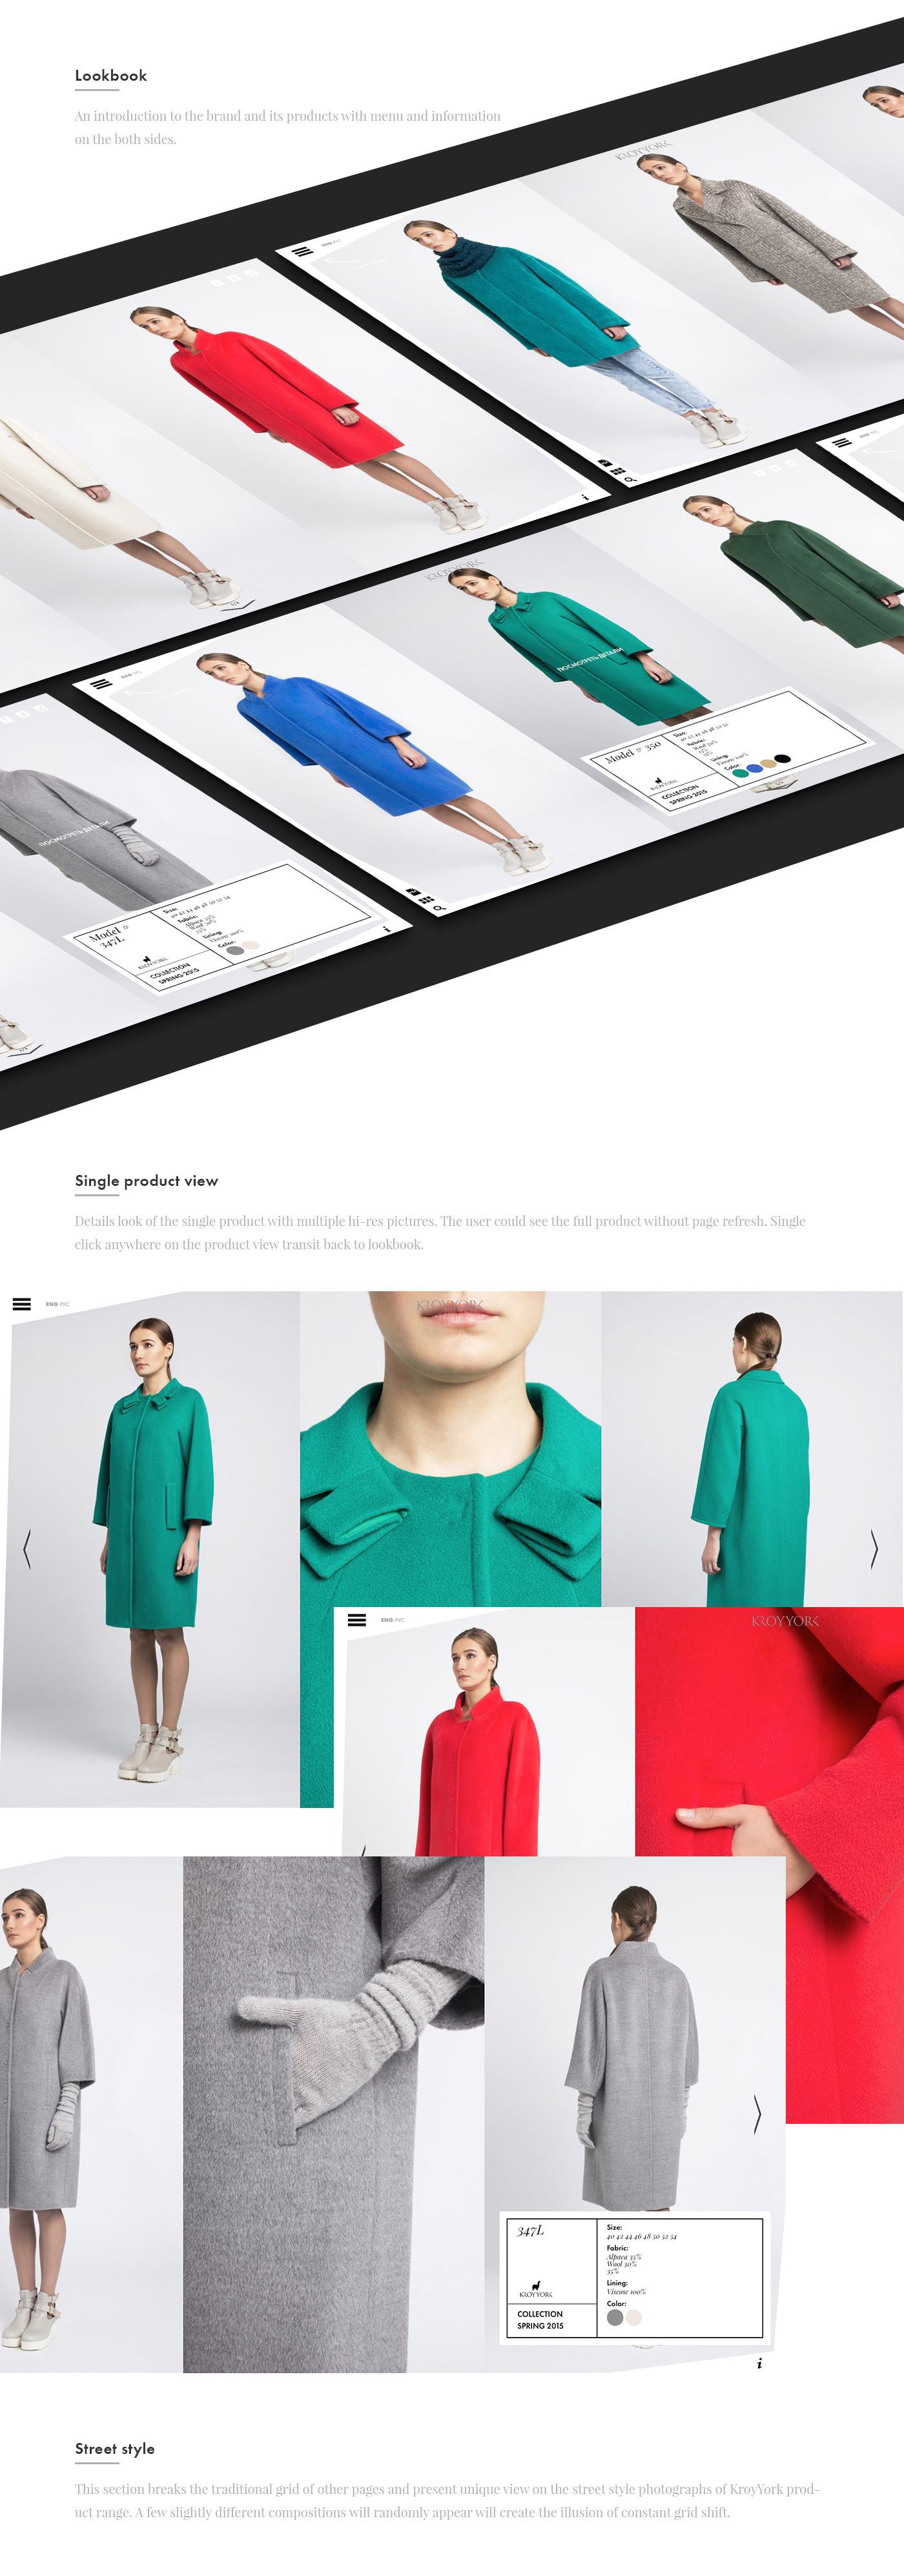 promo Website site interactive Russia shop e-shop fullscreen coat Lookbook streetstyle woman trendy